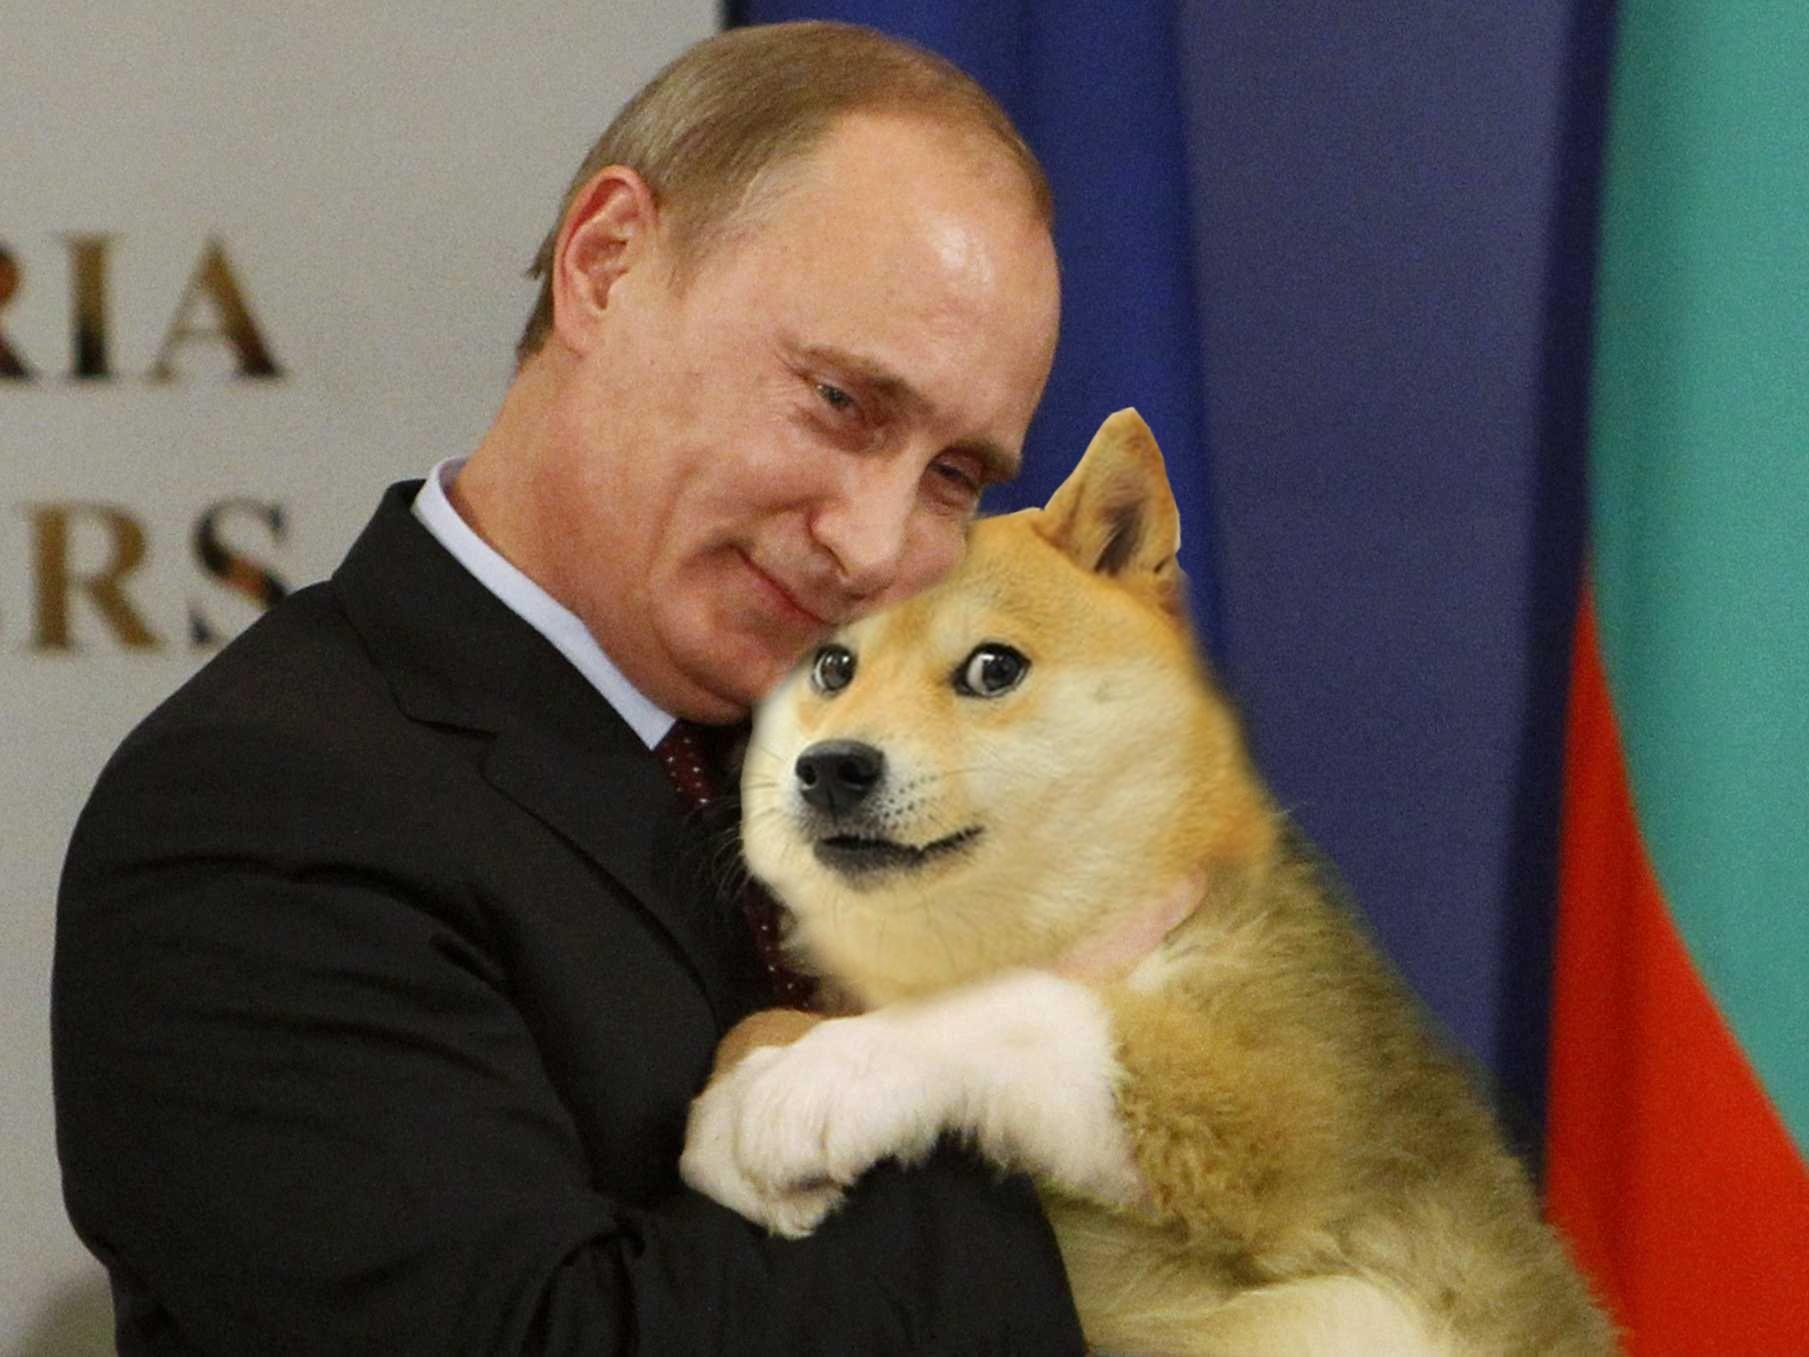 Putin loves doge | Doge meme, Russian memes, Top memes